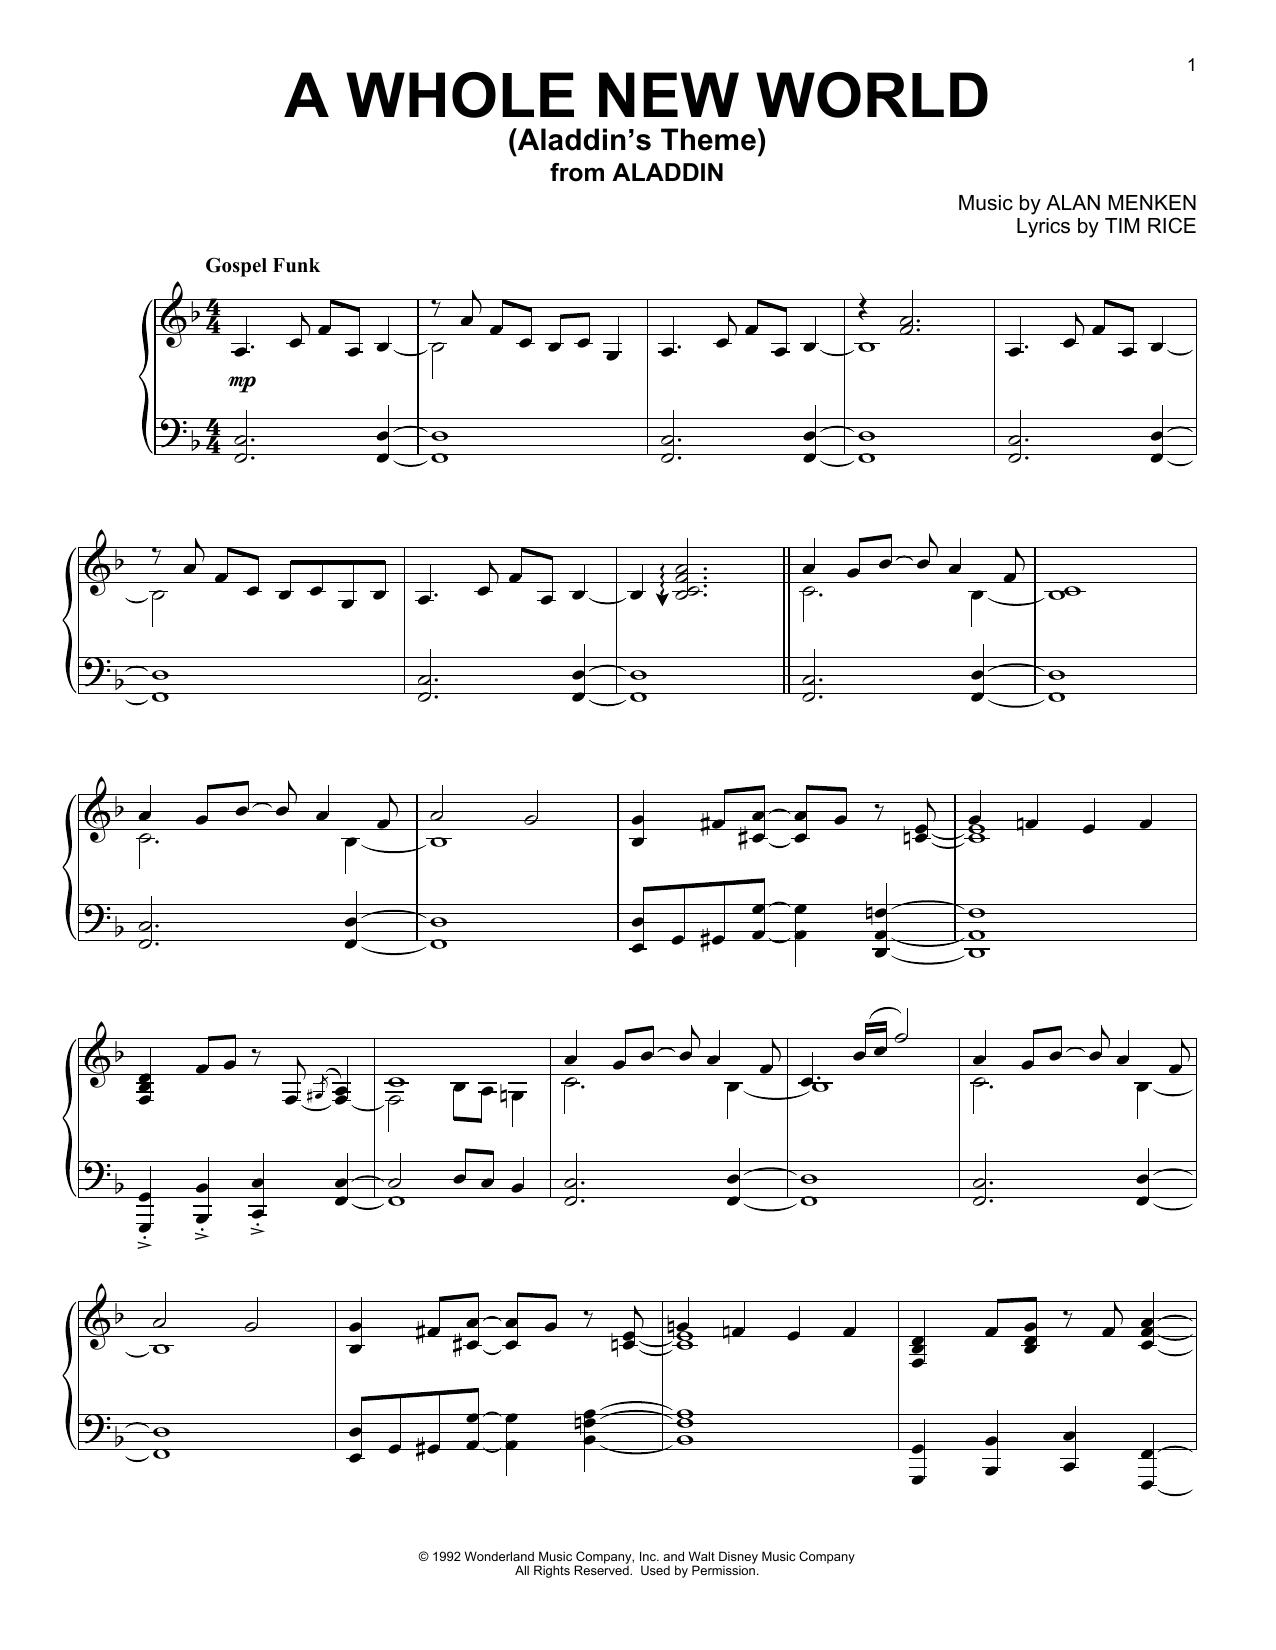 A Whole New World (from Aladdin) (Piano Solo)